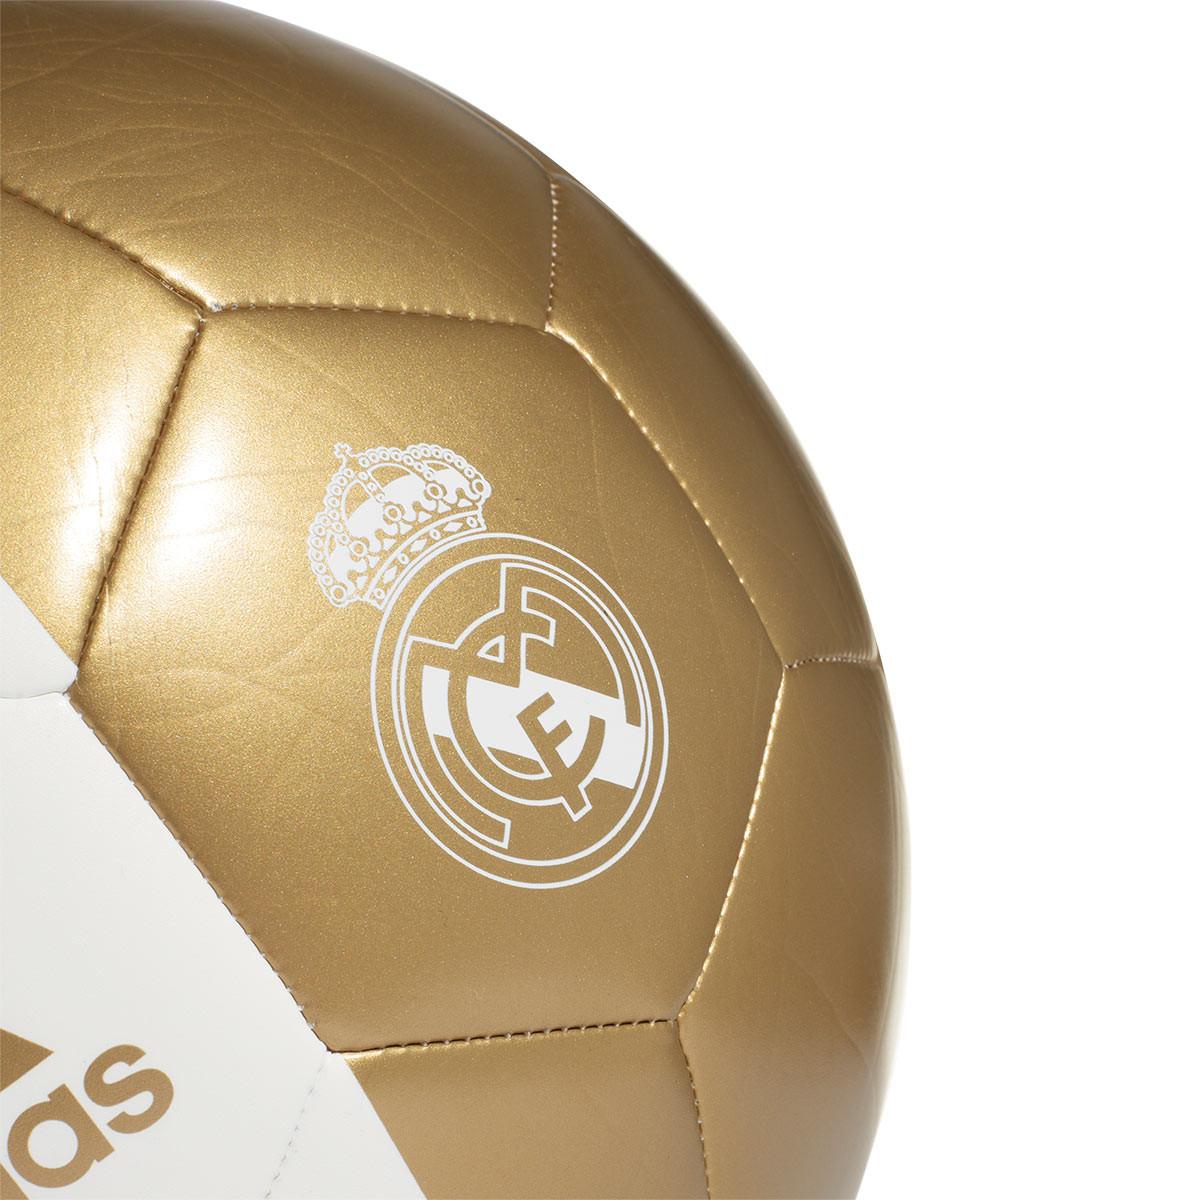 d3d5c0ba0 Balón adidas Capitano Real Madrid 2019-2020 White-Dark football gold -  Tienda de fútbol Fútbol Emotion